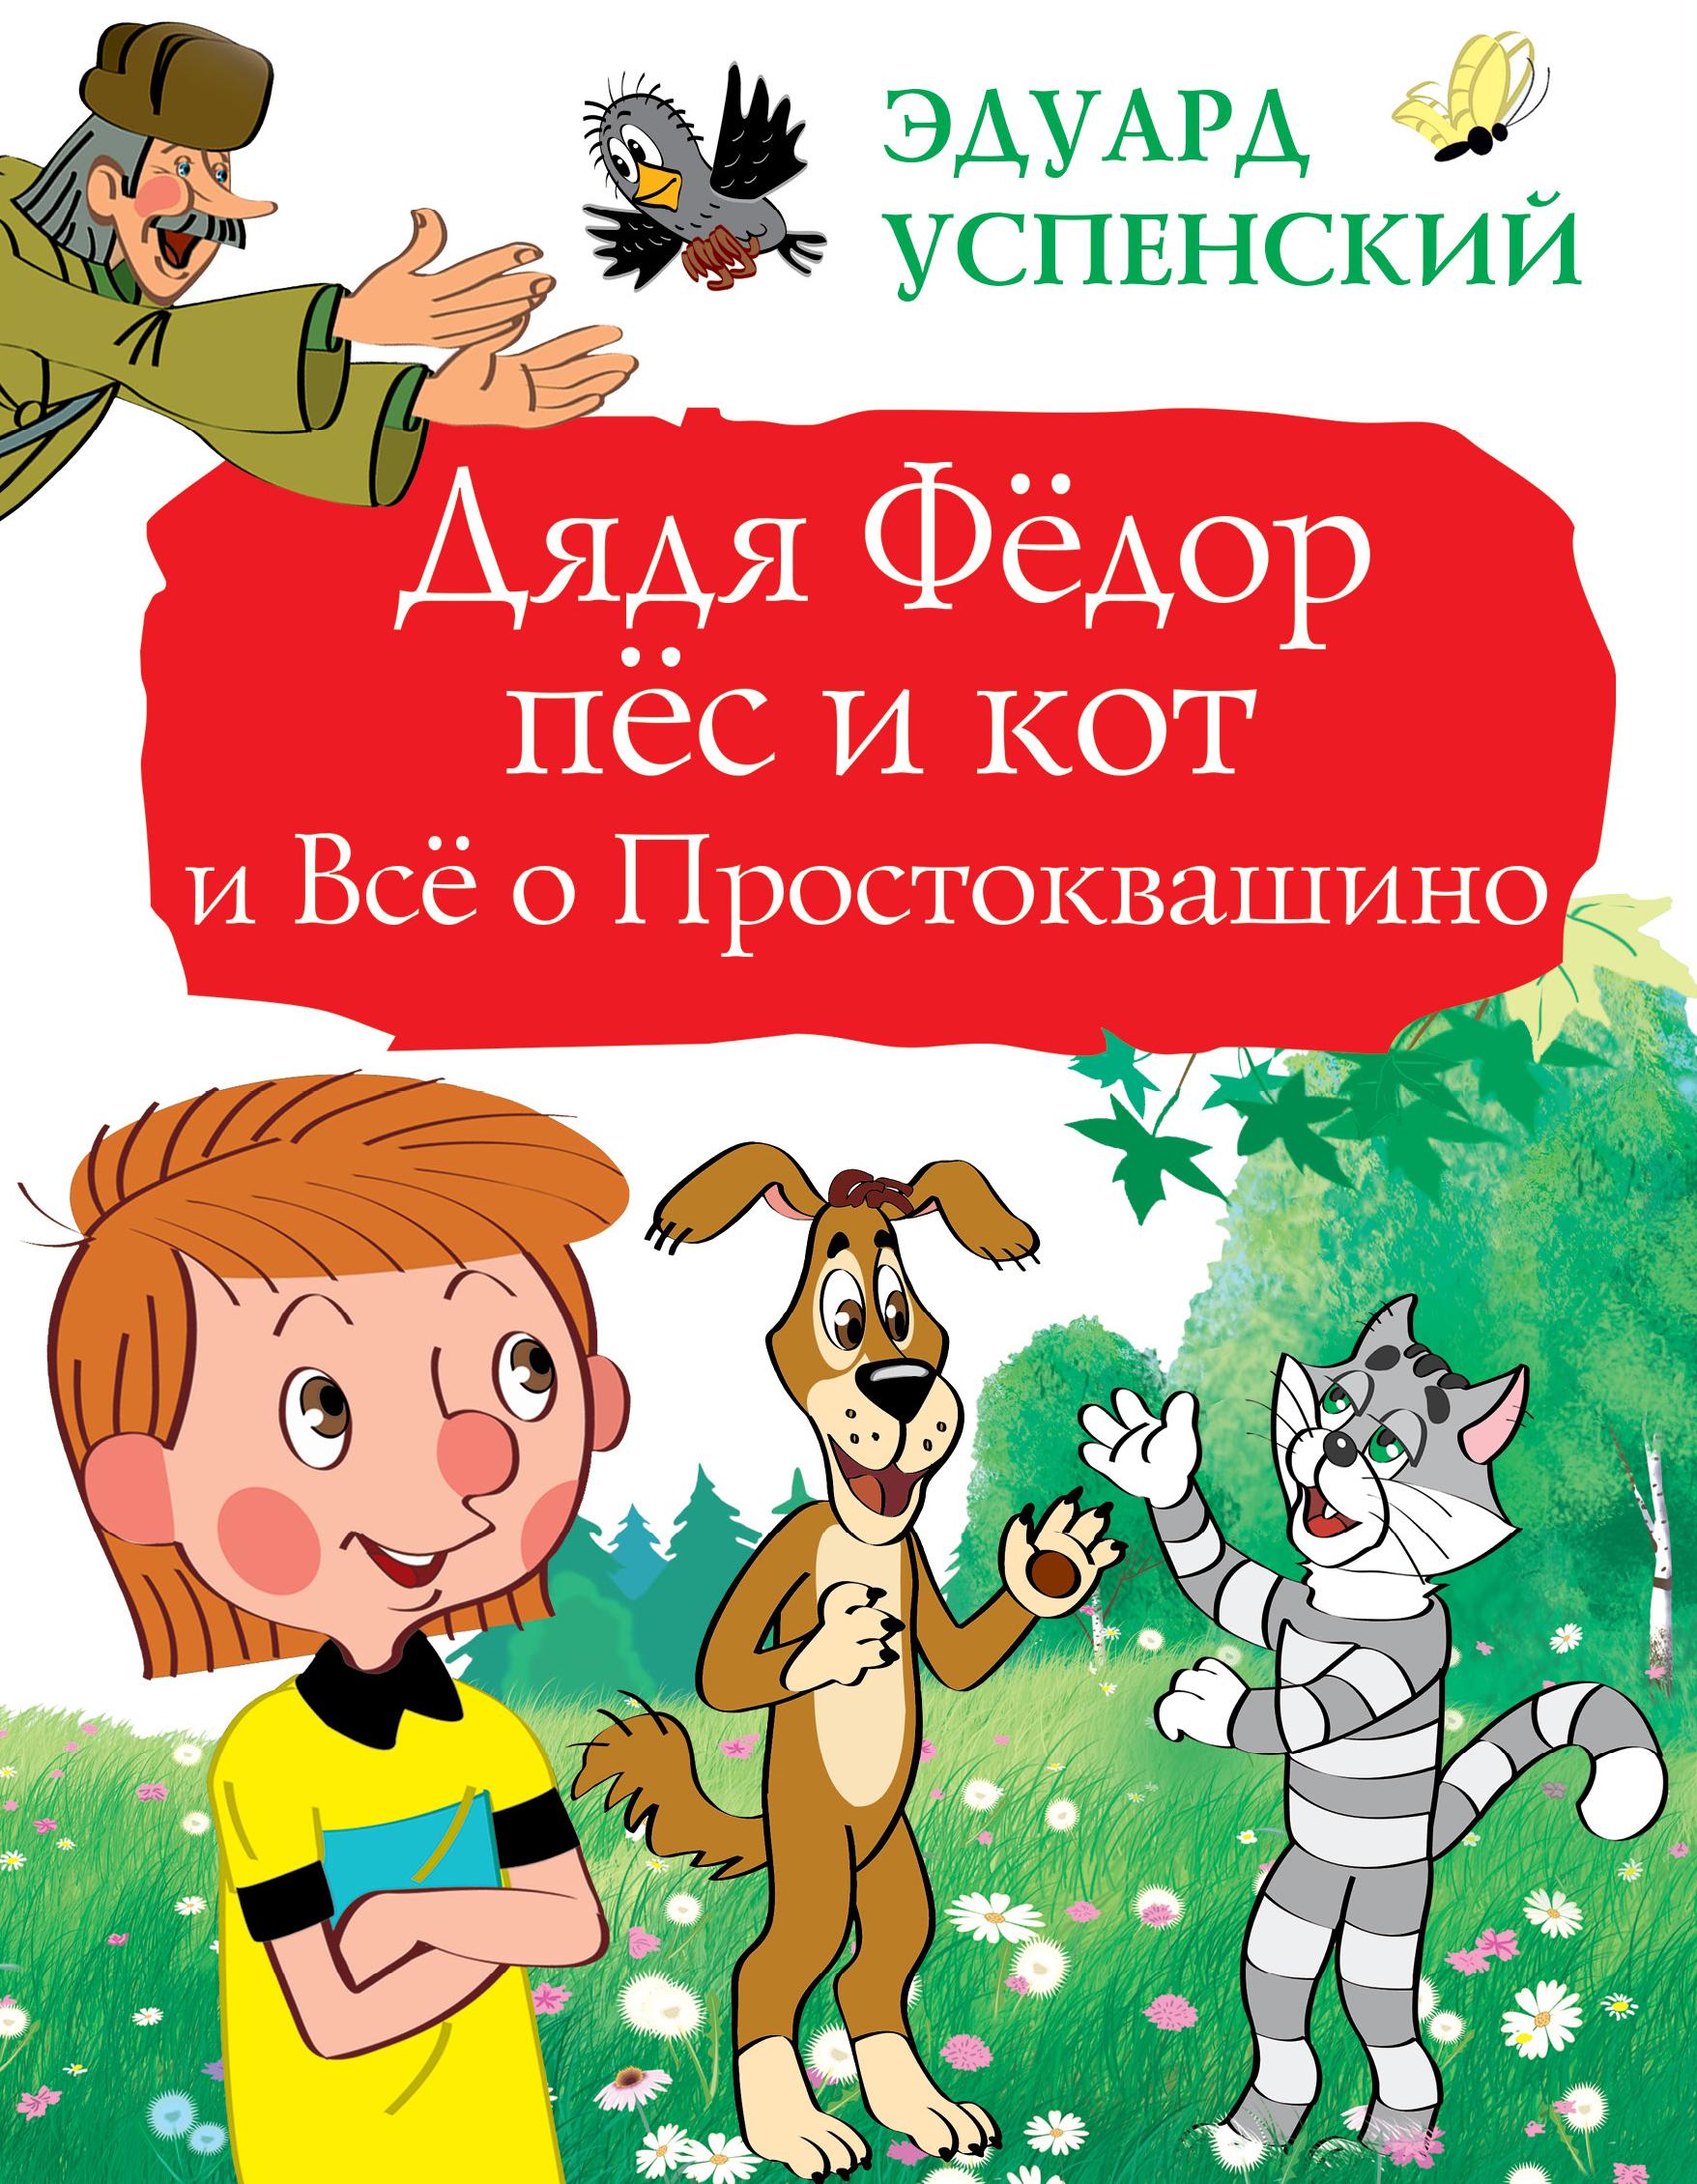 Книги про дядю федора с картинками